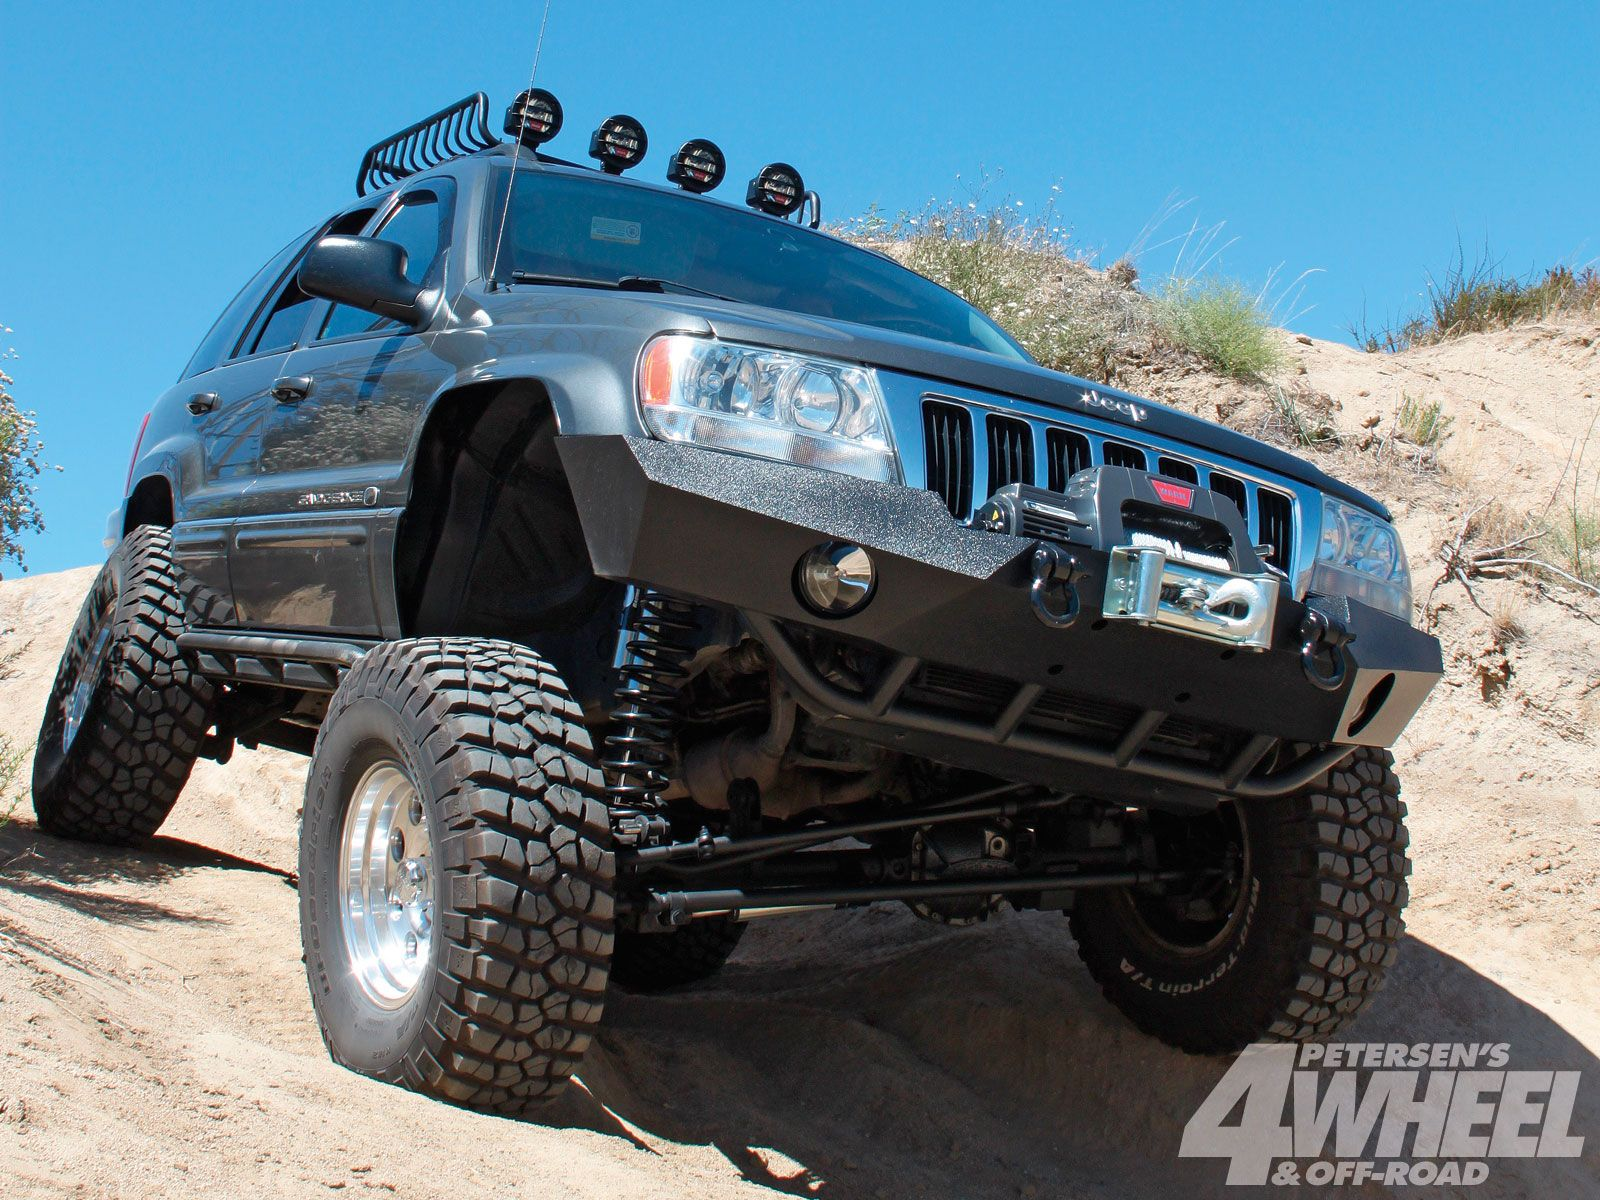 2004 Jeep Grand Cherokee Inspiration Jeep Grand Cherokee Jeep